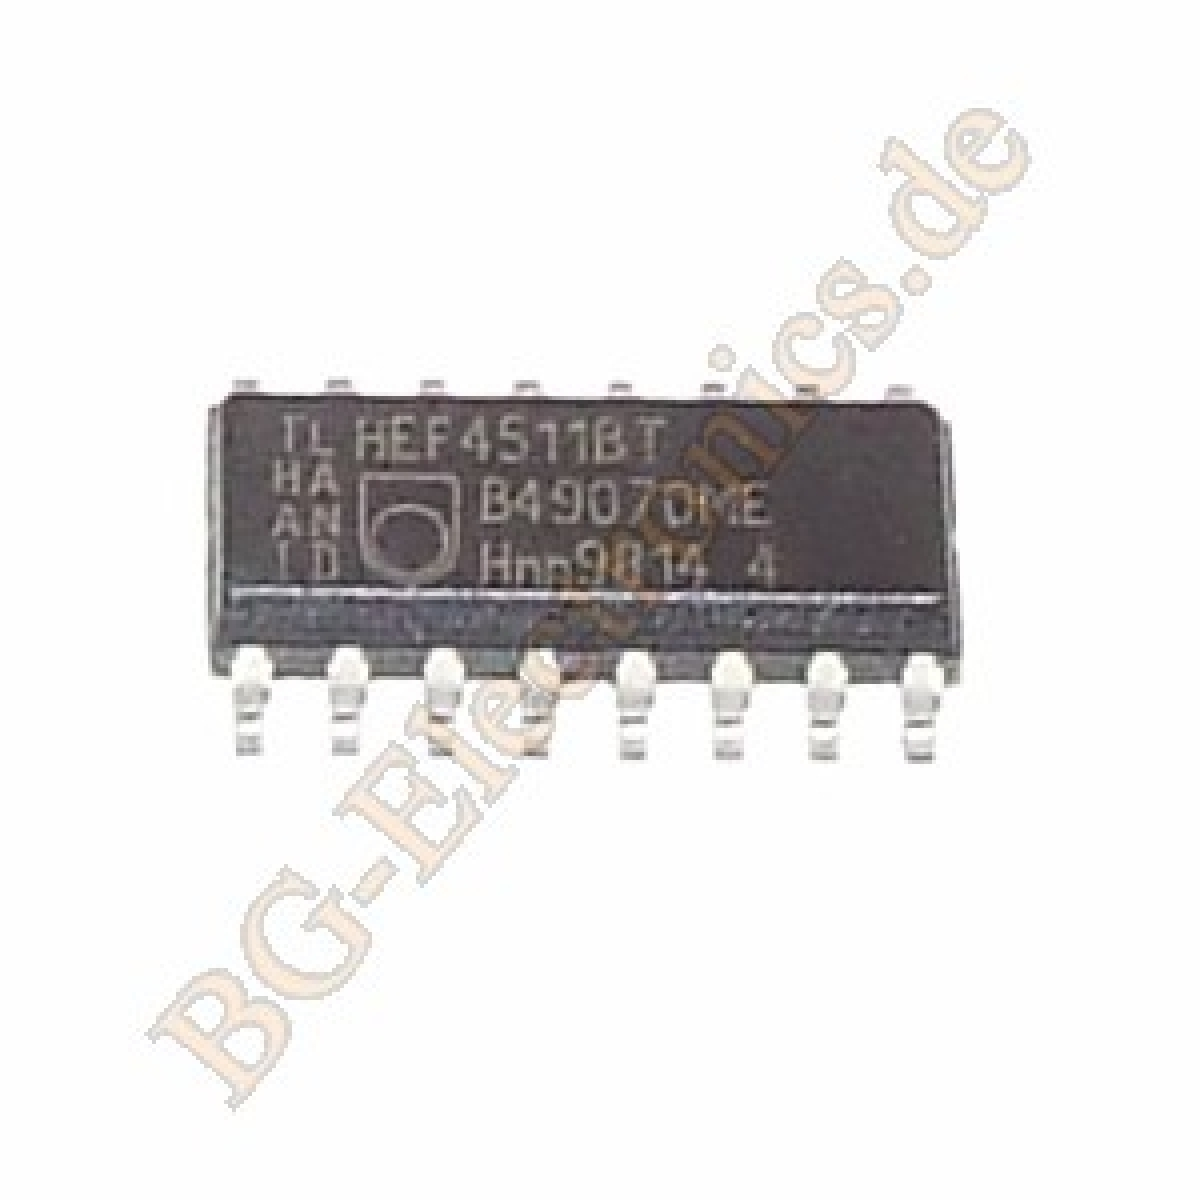 2-x-HEF4511BT-BCD-to-7-segment-latch-decoder-driver-Philips-SO-16-2pcs